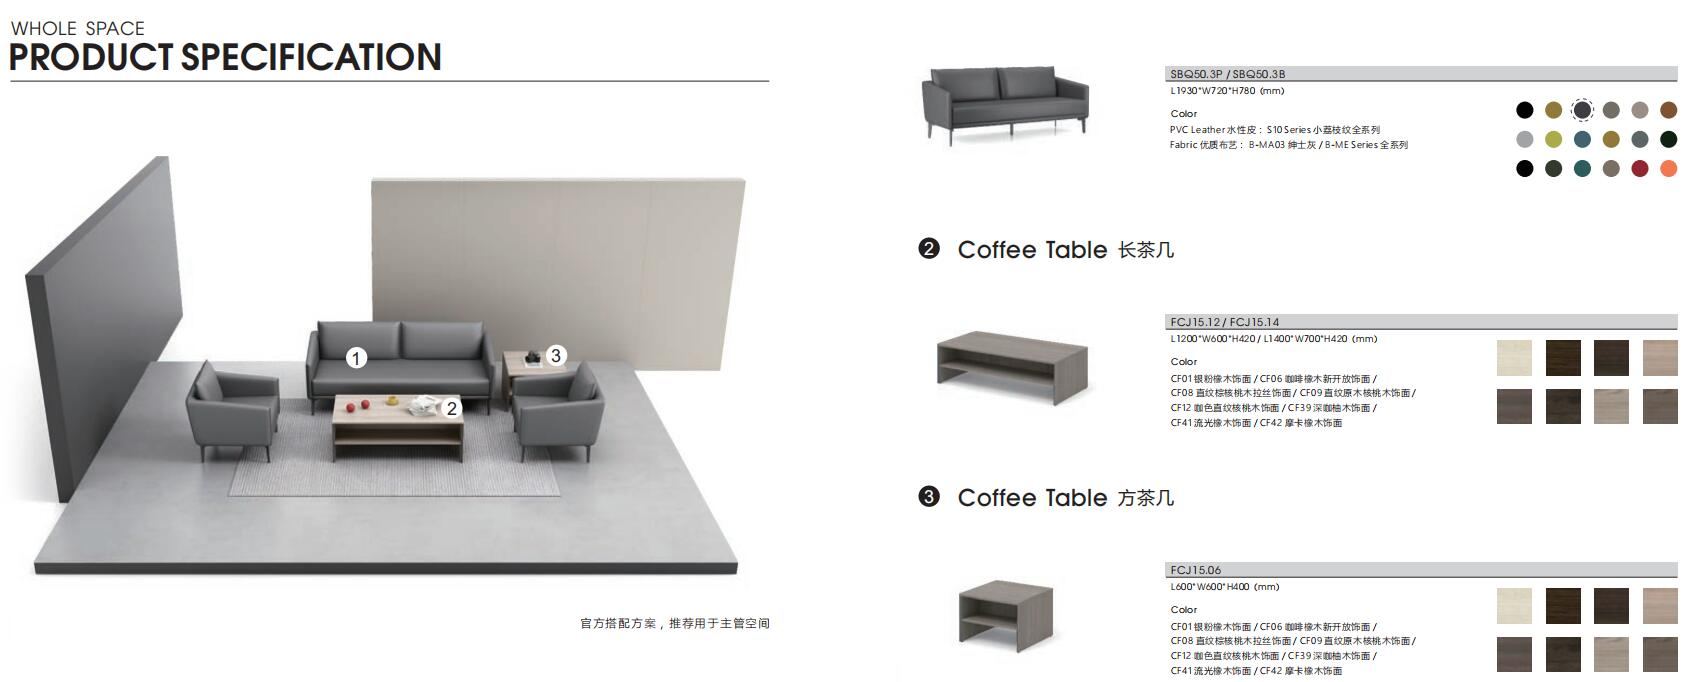 Becute缤趣系列老款友博国际棋牌室沙发官方配套方案